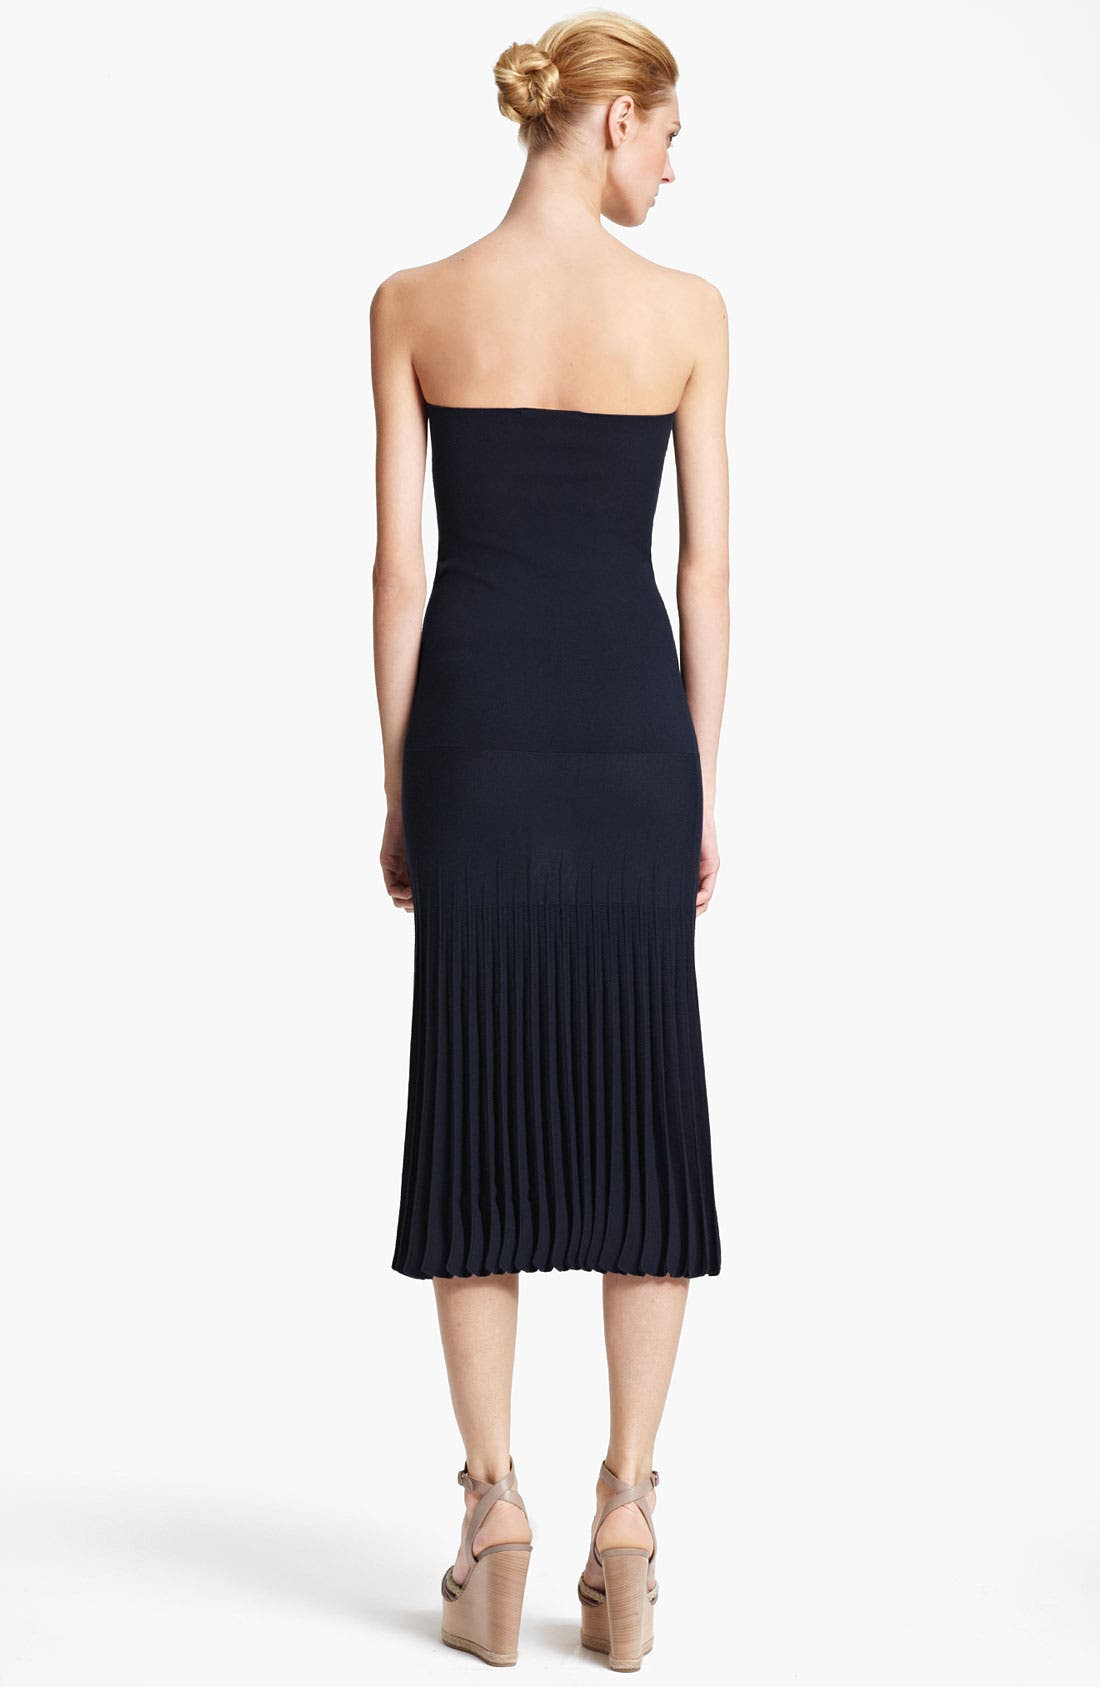 Alternate Image 2  - Donna Karan Collection 'Infinity' Strapless Stretch Knit Dress